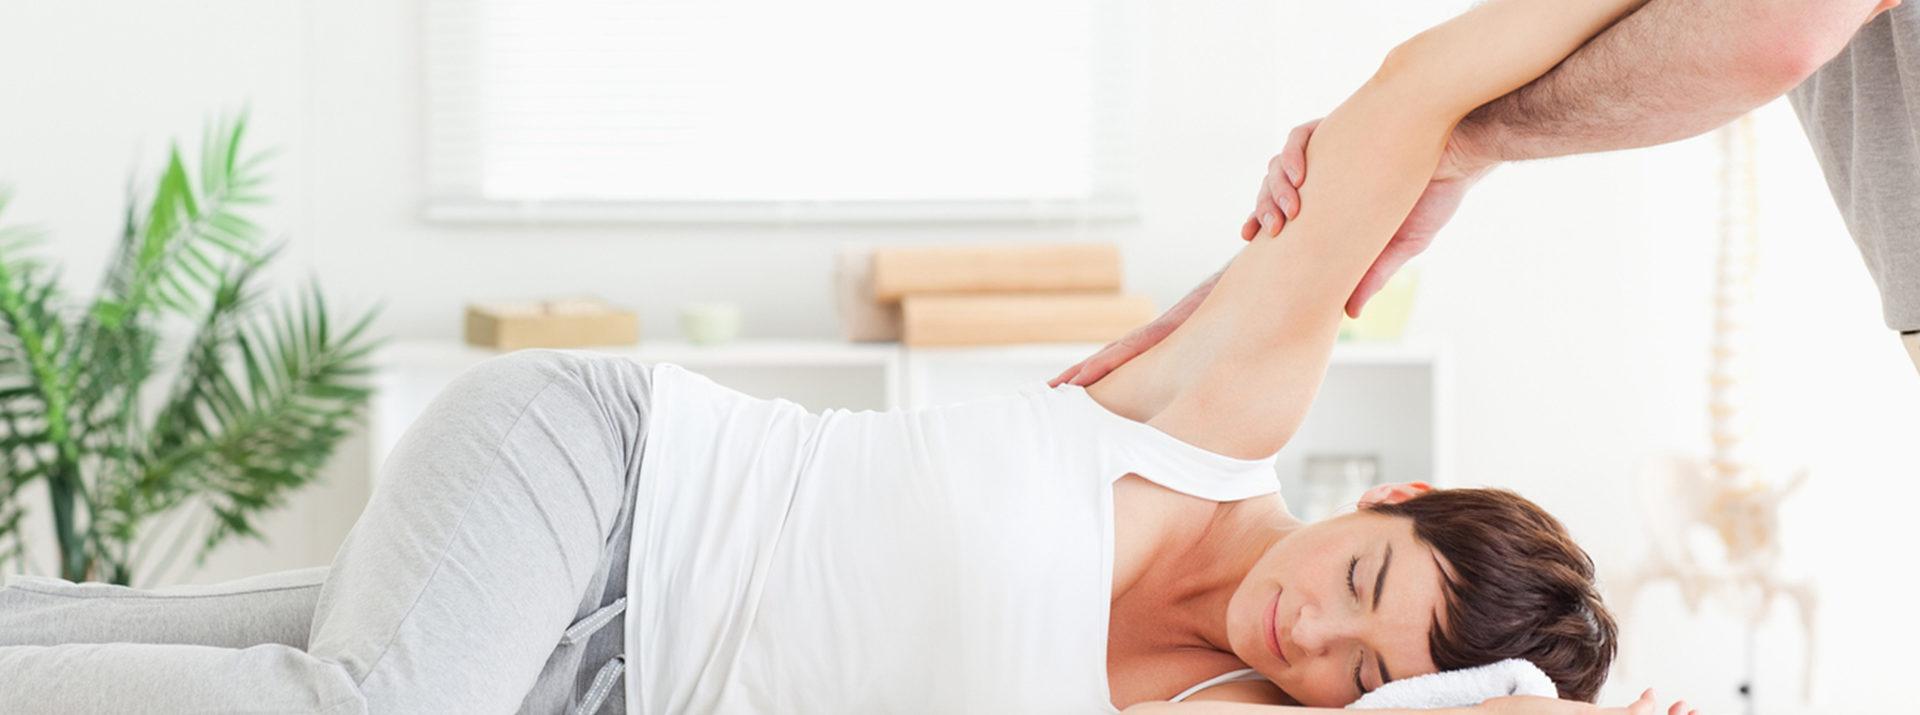 Physionique - Praxis für Physiotherapie